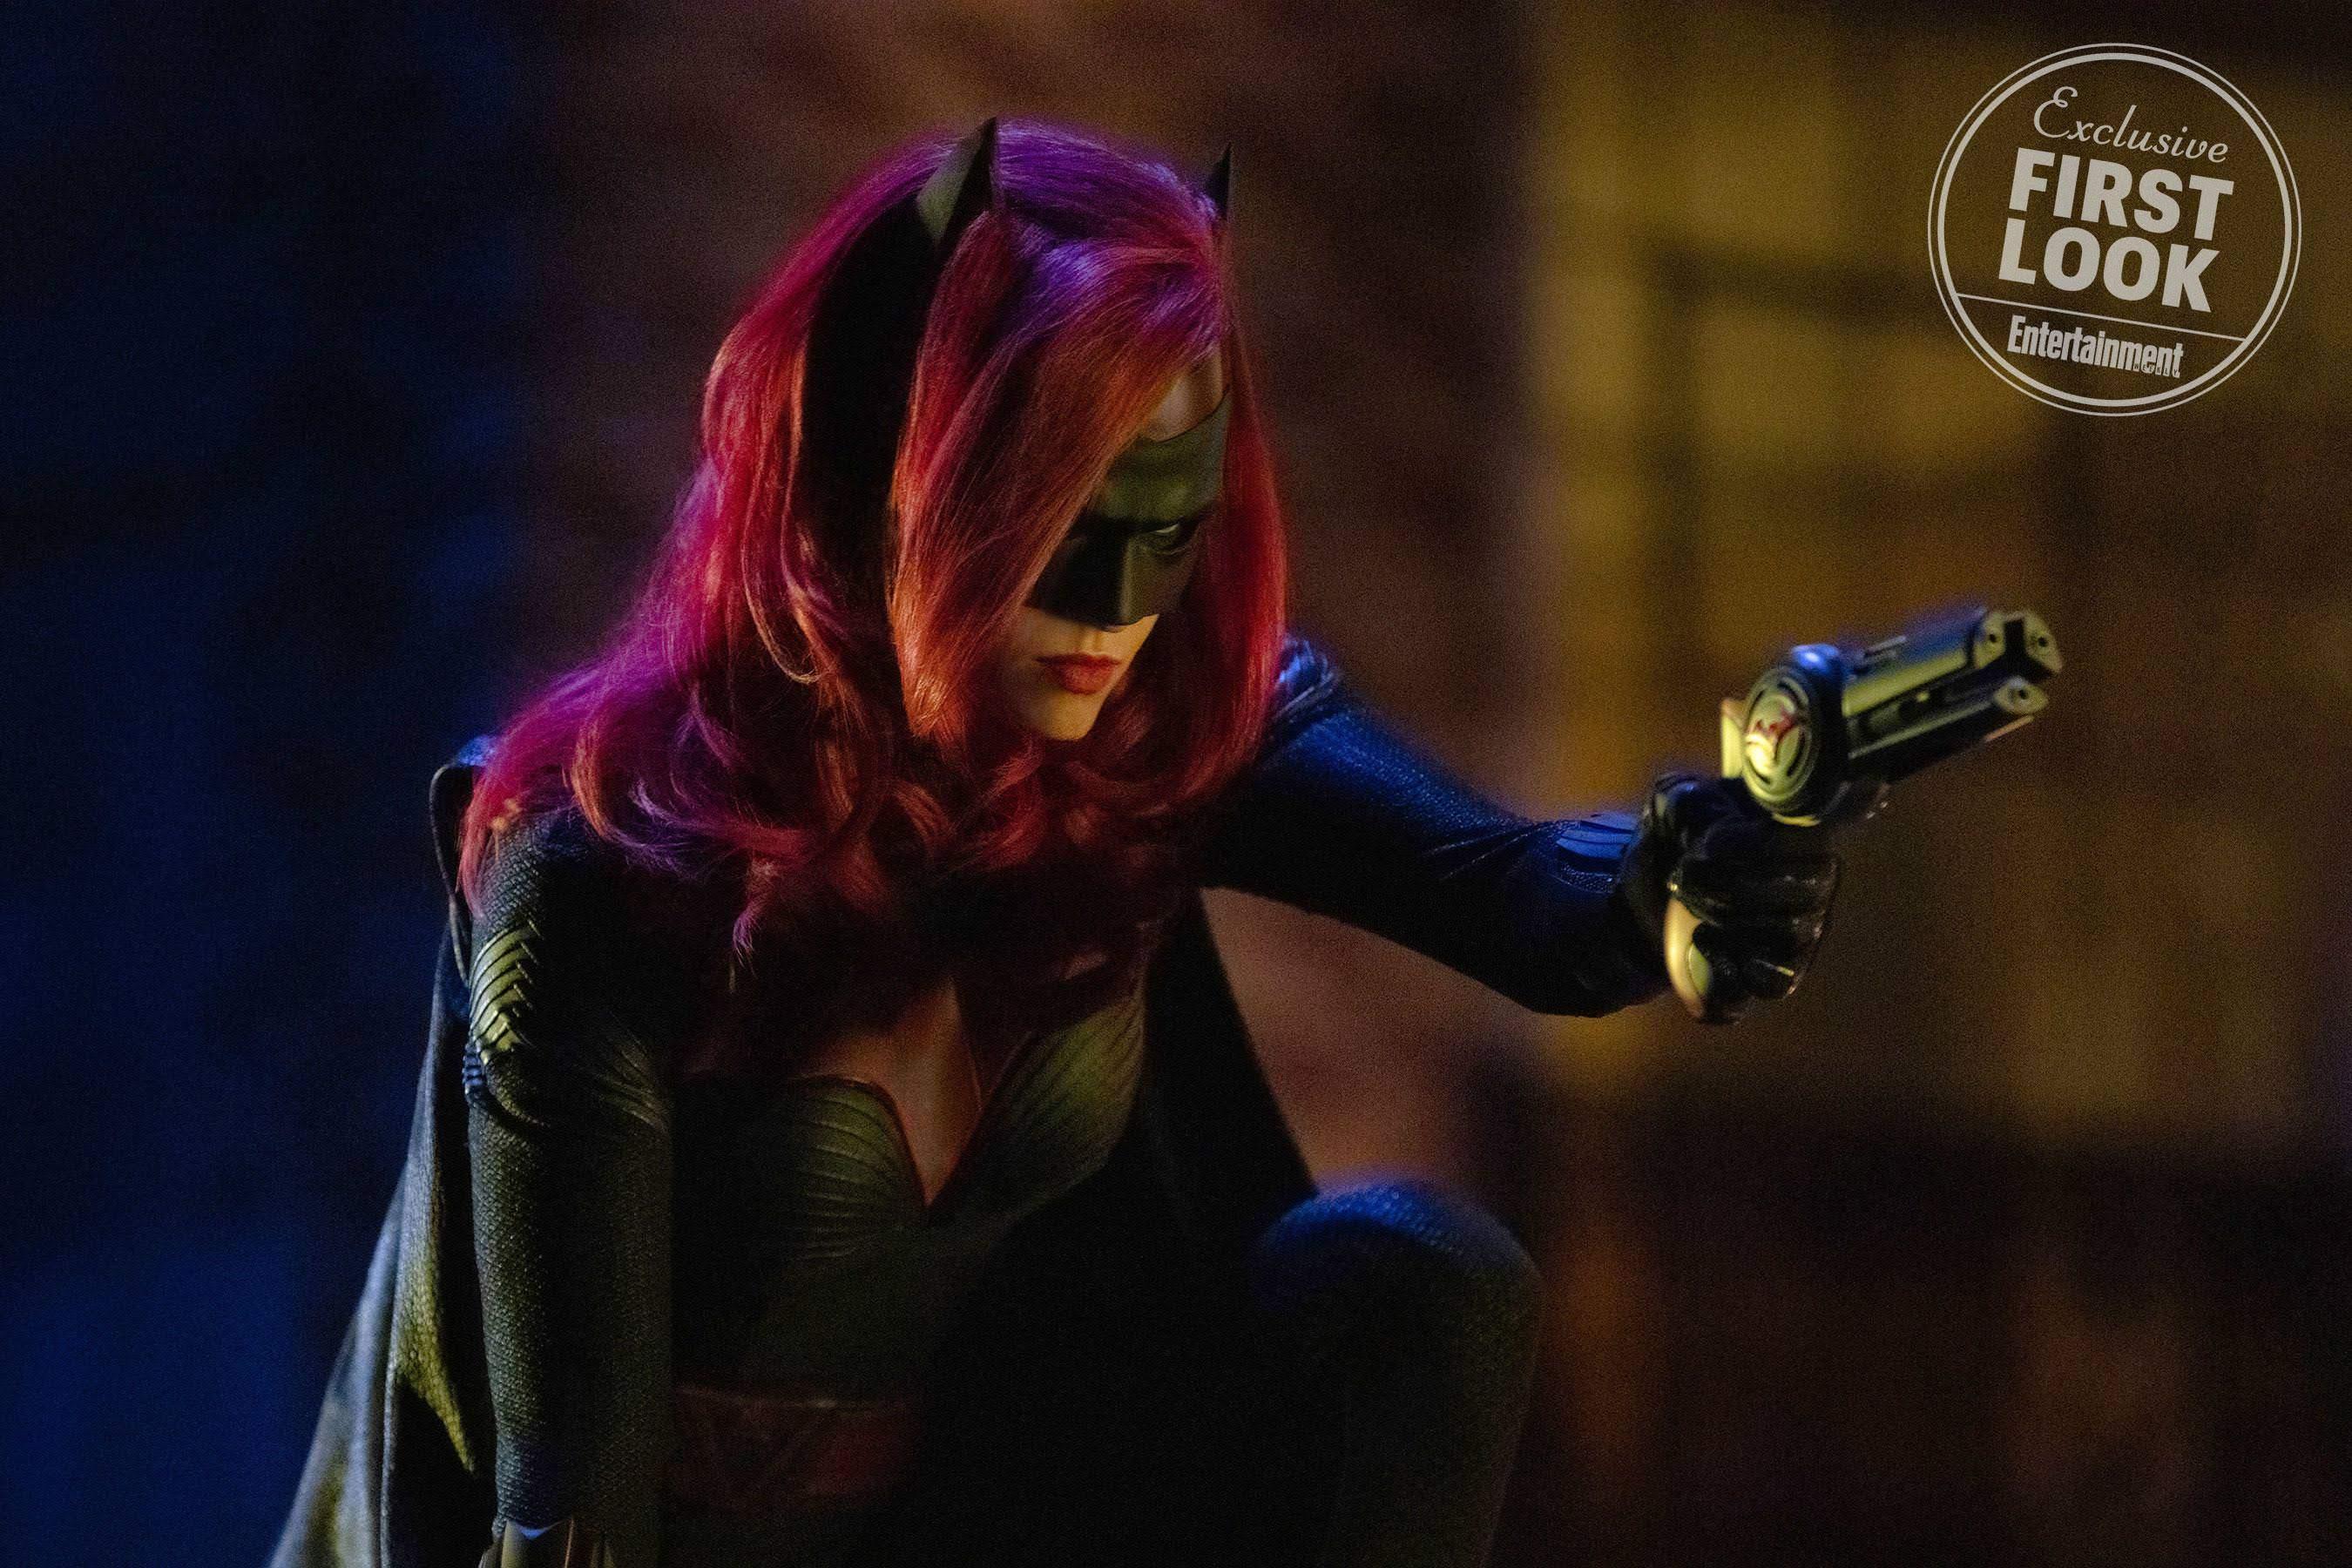 Arrowverse Crossover ELSEWORLDS Teaser - Ruby Rose in action as Batwoman : ルビー・ローズのバットウーマンが初登場 ! !、DC コミックスのヒーロー・ドラマ、アローバースのクロスオーバー特番「エルスワールズ」の新しい予告編 ! !